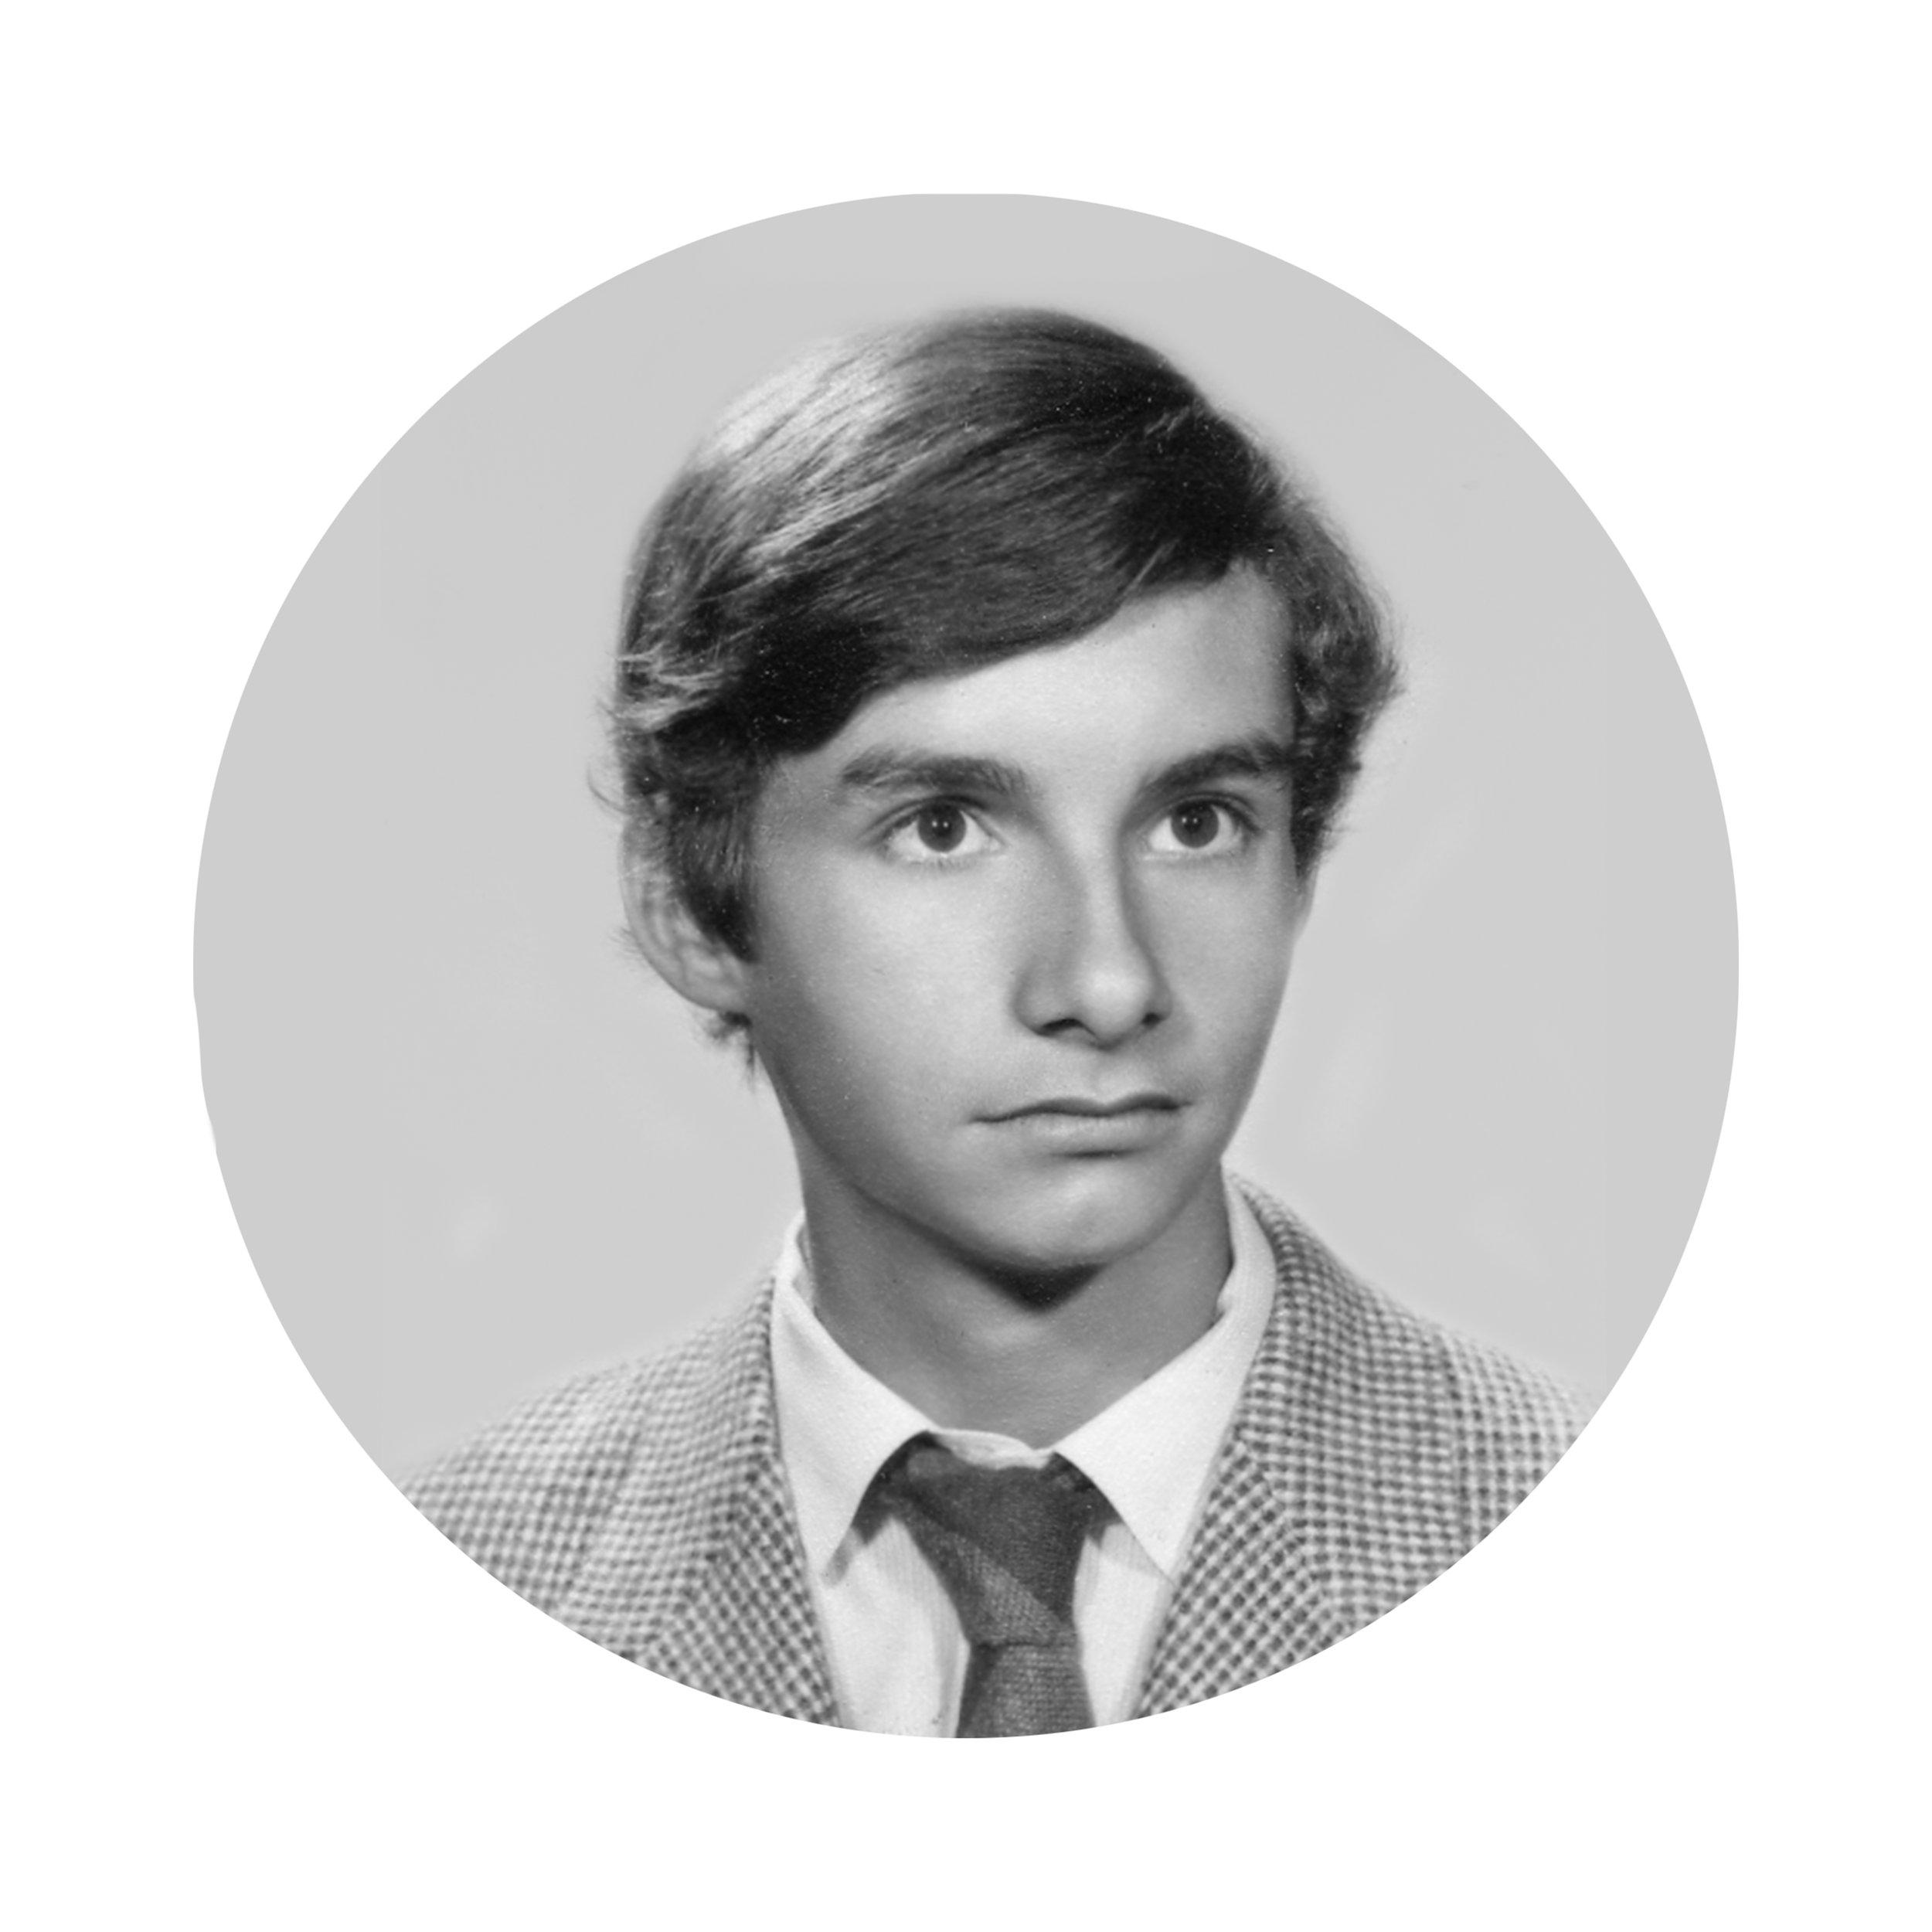 Me, 1971